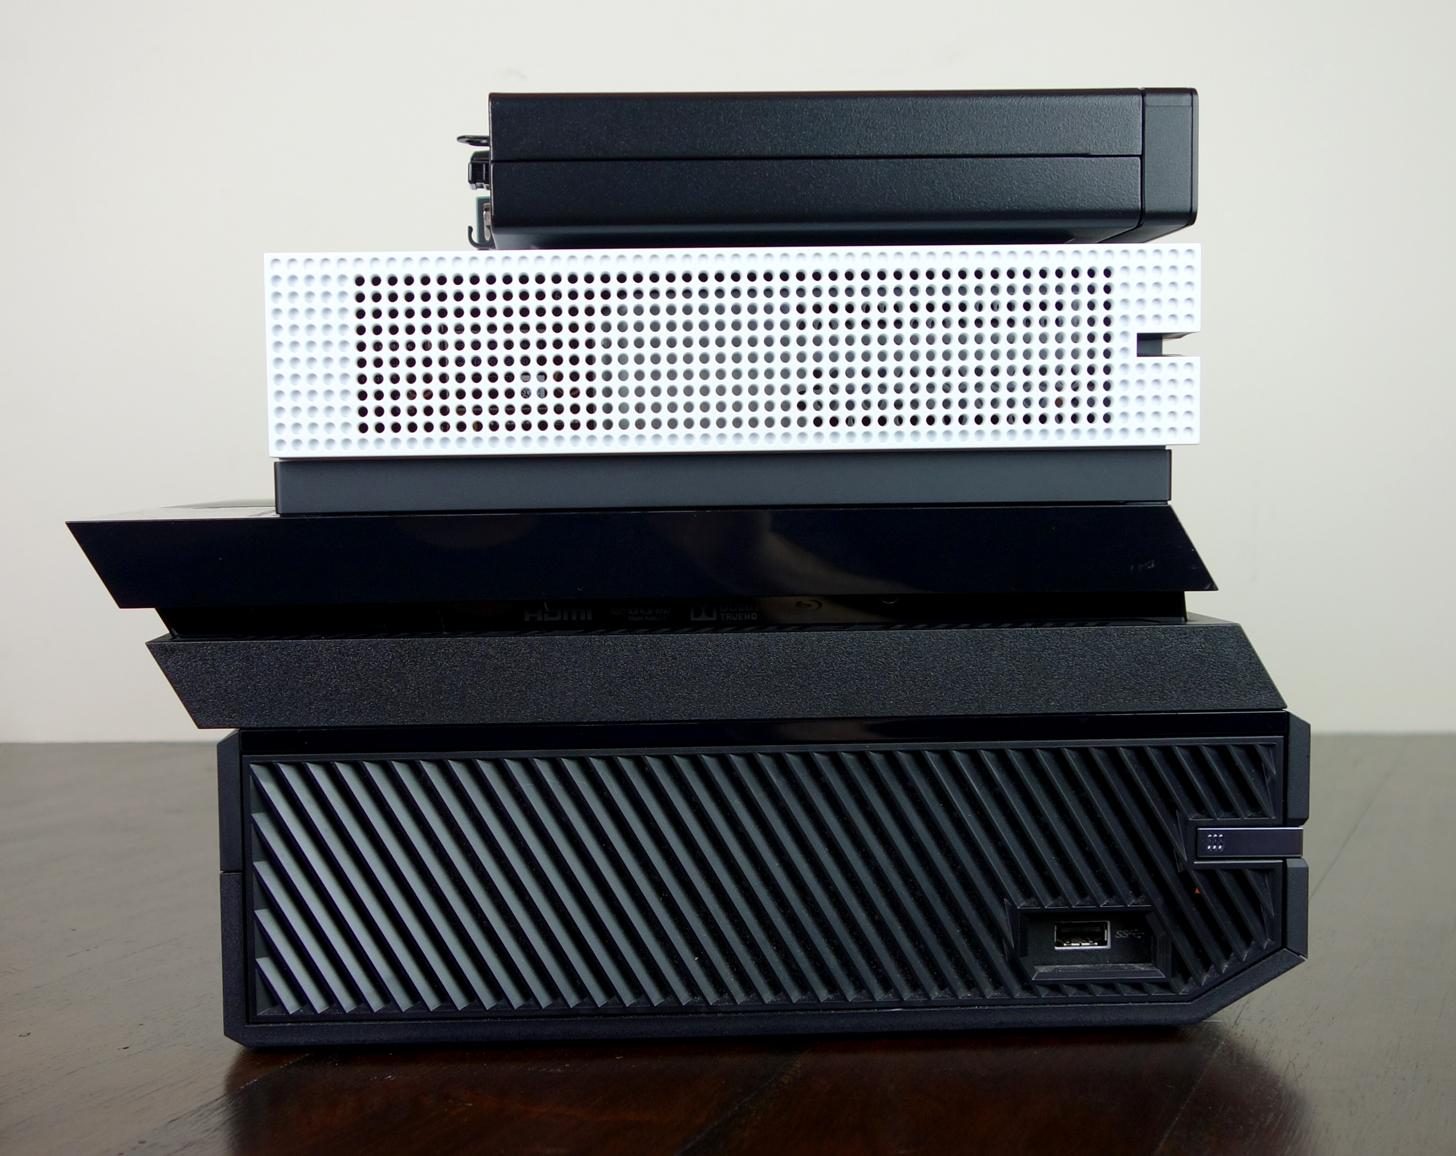 Xbox One S stack PS4 OG HP EliteDesk side